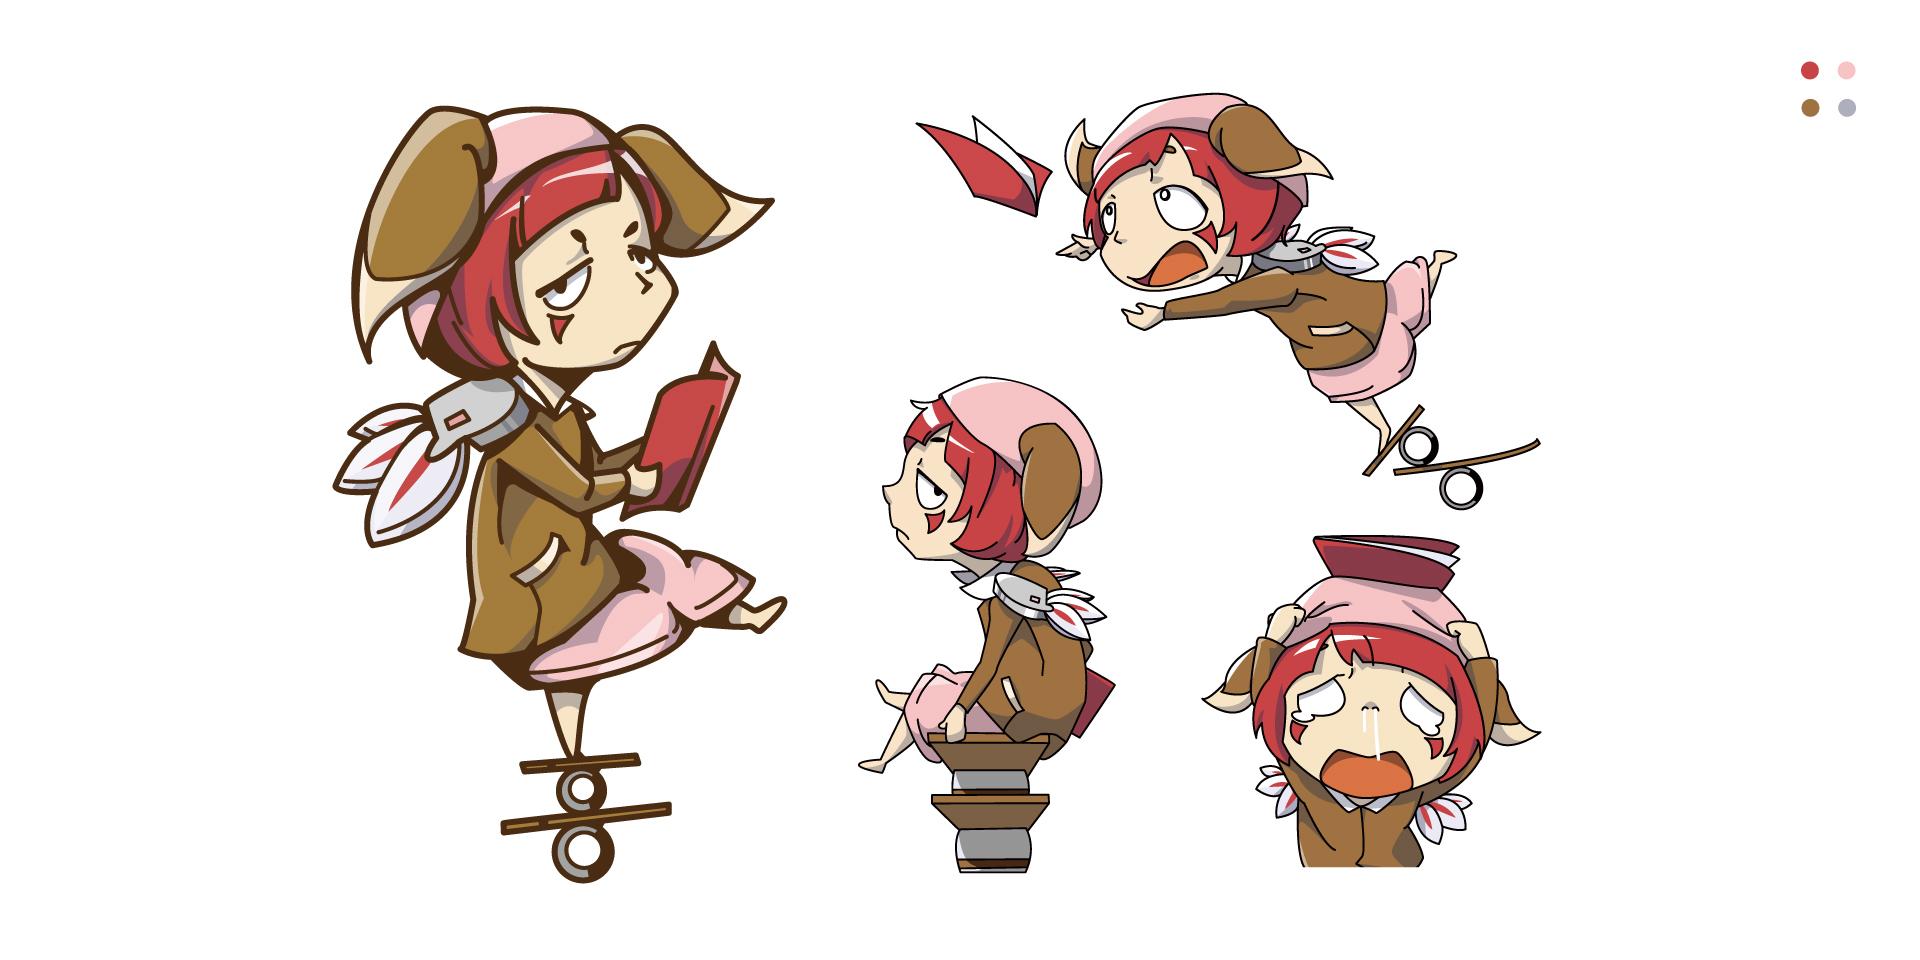 characterカンプ